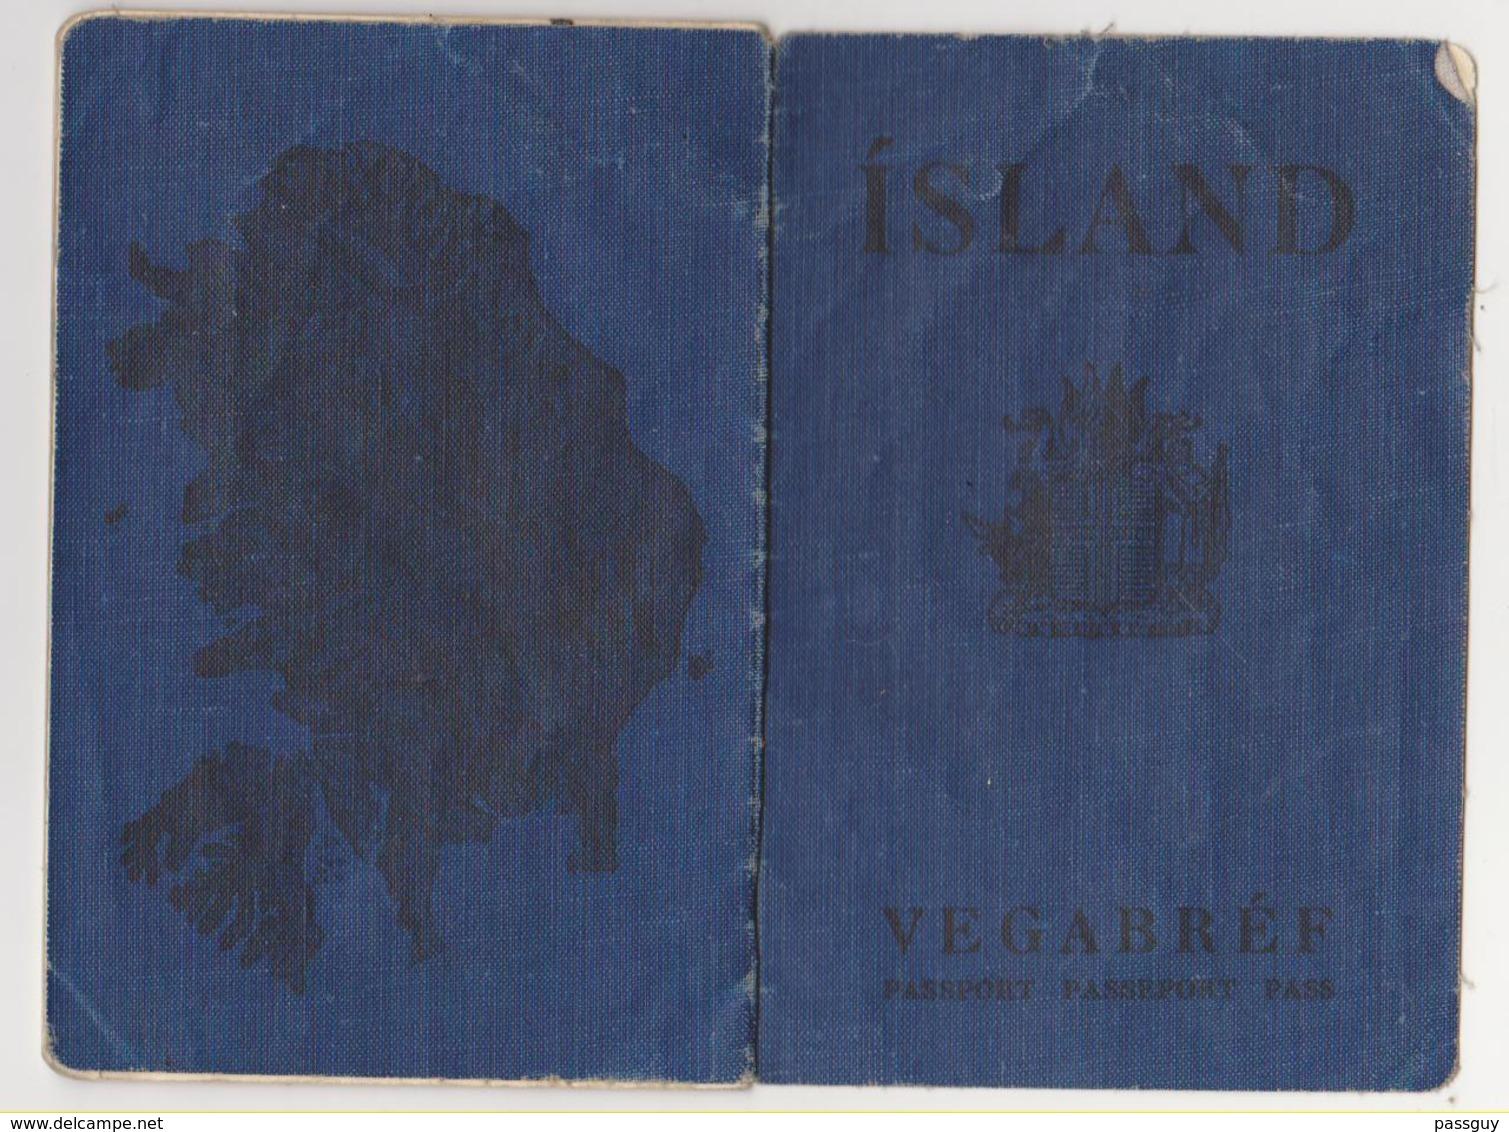 ICELAND Passport 1956 ISLANDE Passeport – Reisepaß - Documents Historiques